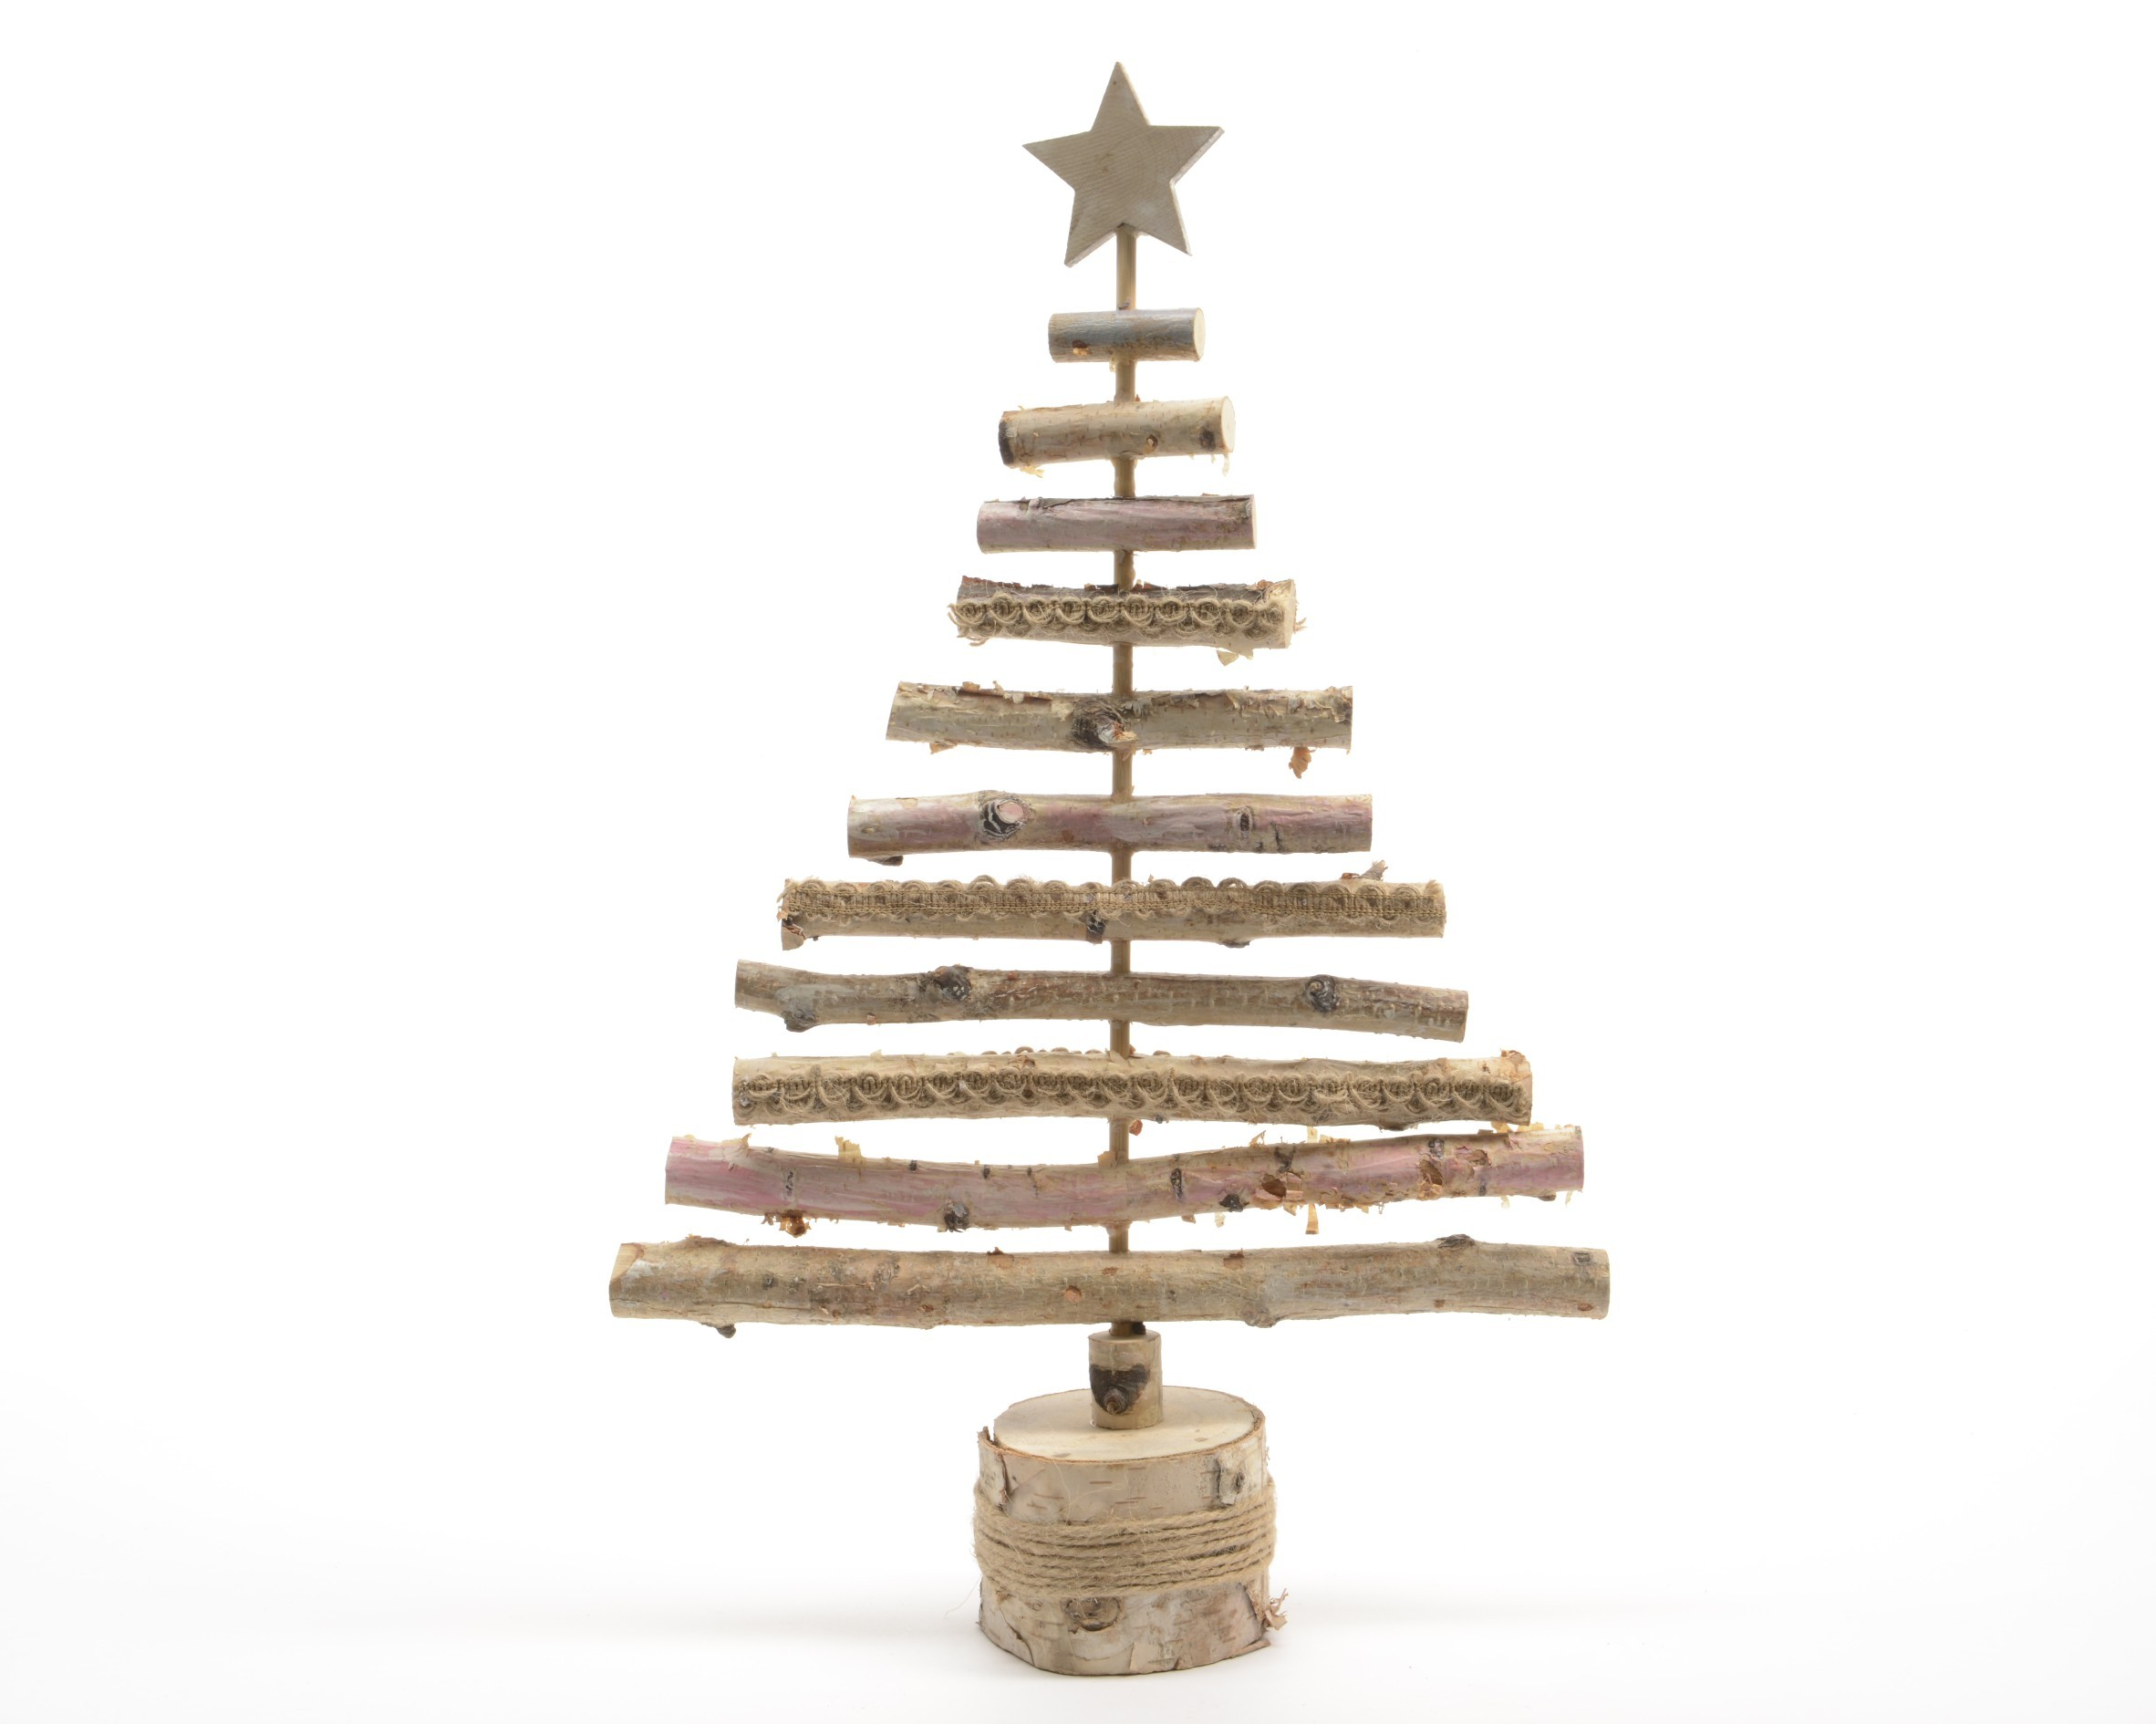 Arboles de navidad de madera arbol navidad en madera artesanal con manos barniz madera arbol - Arboles de navidad de madera ...